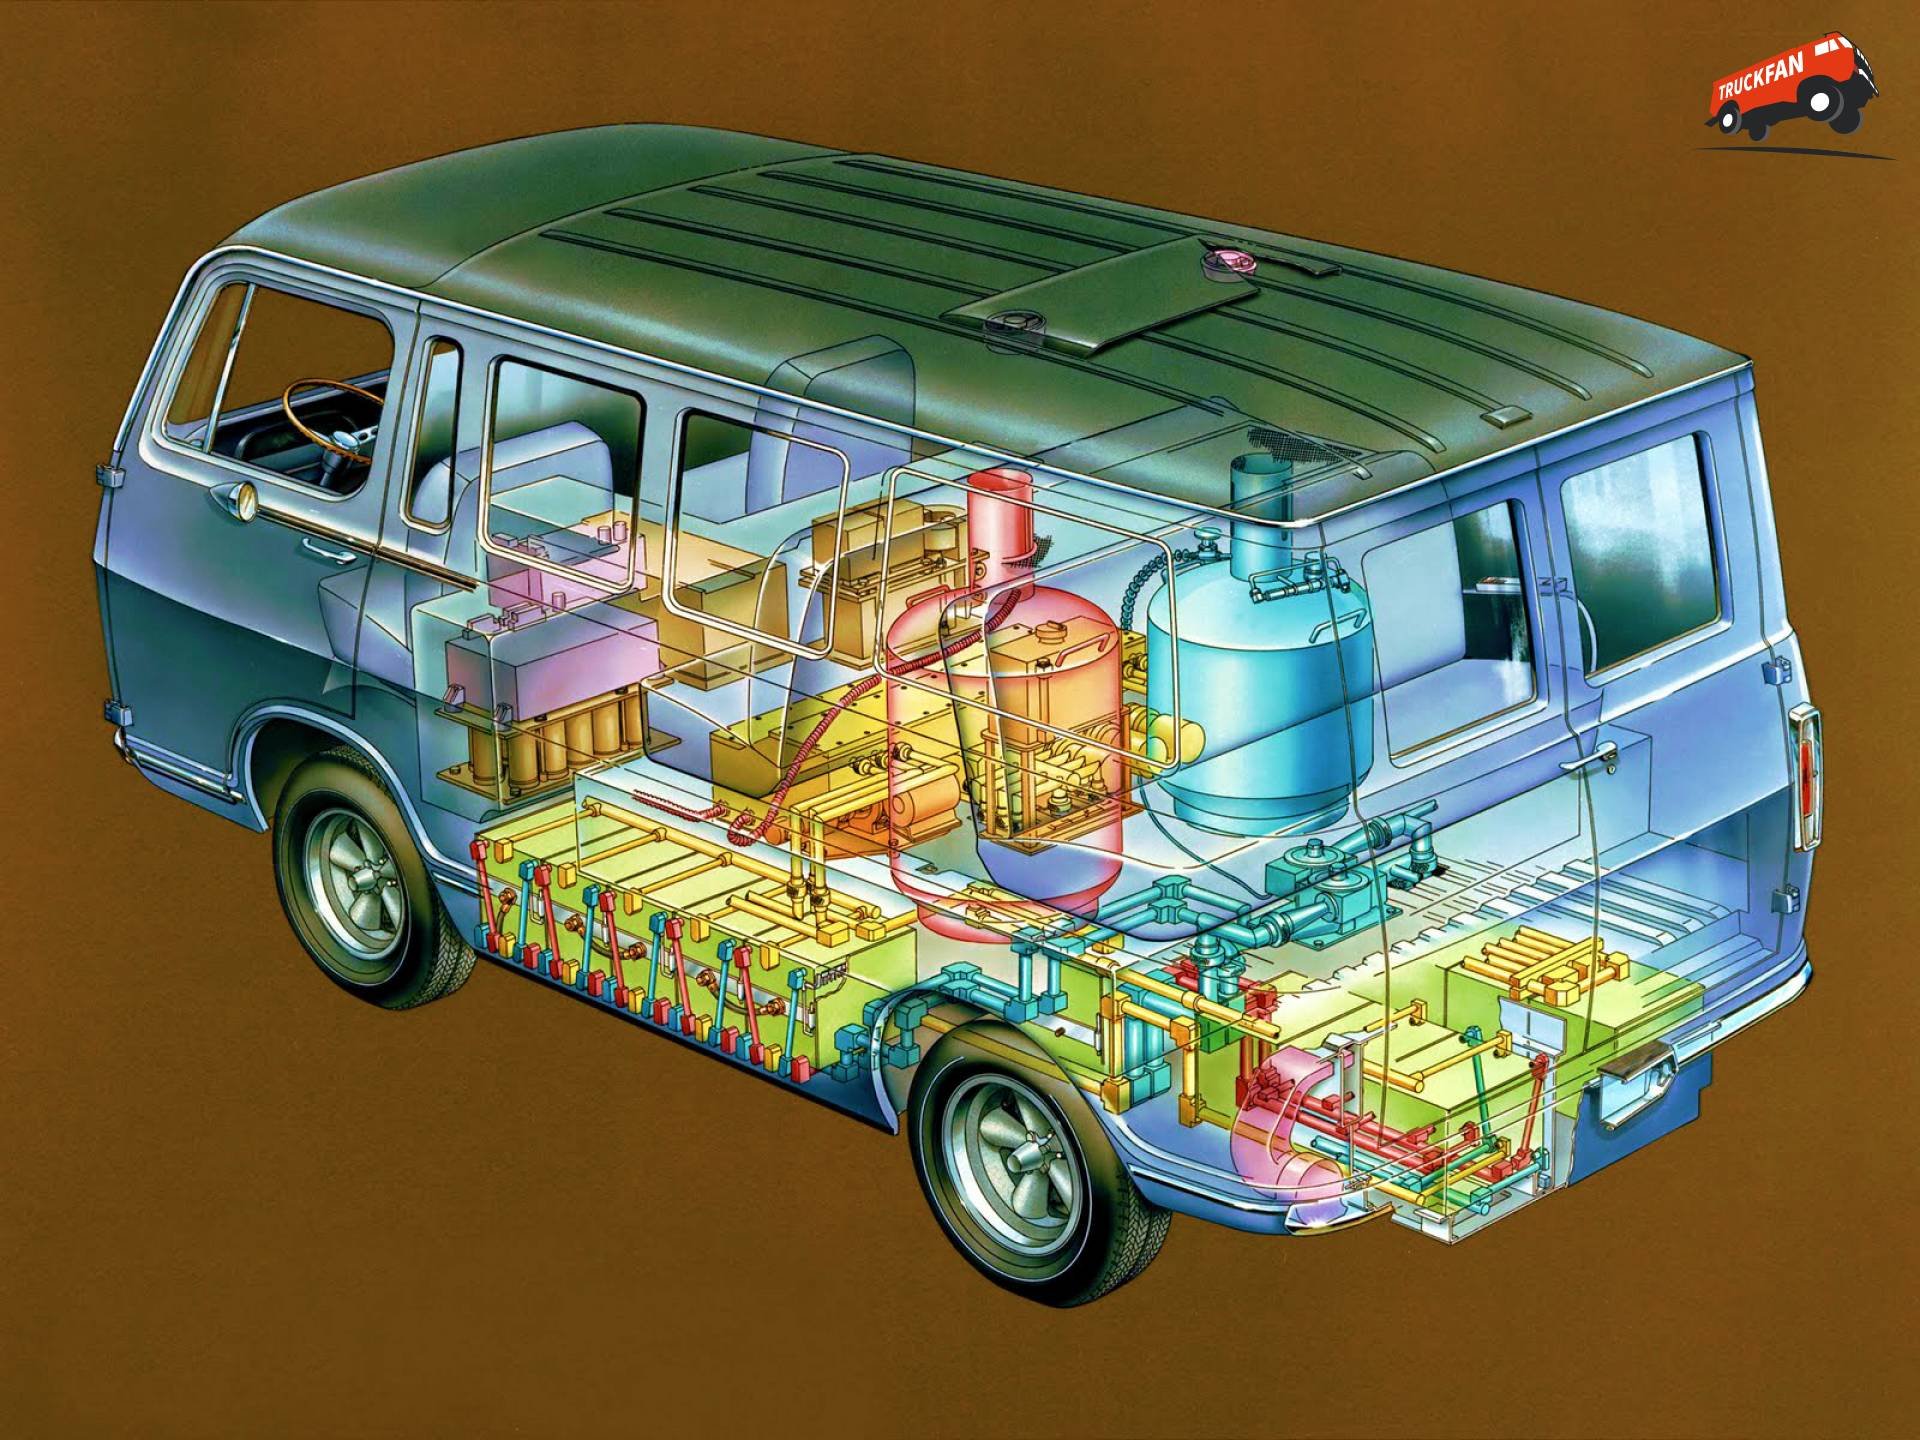 General Motors Electrovan